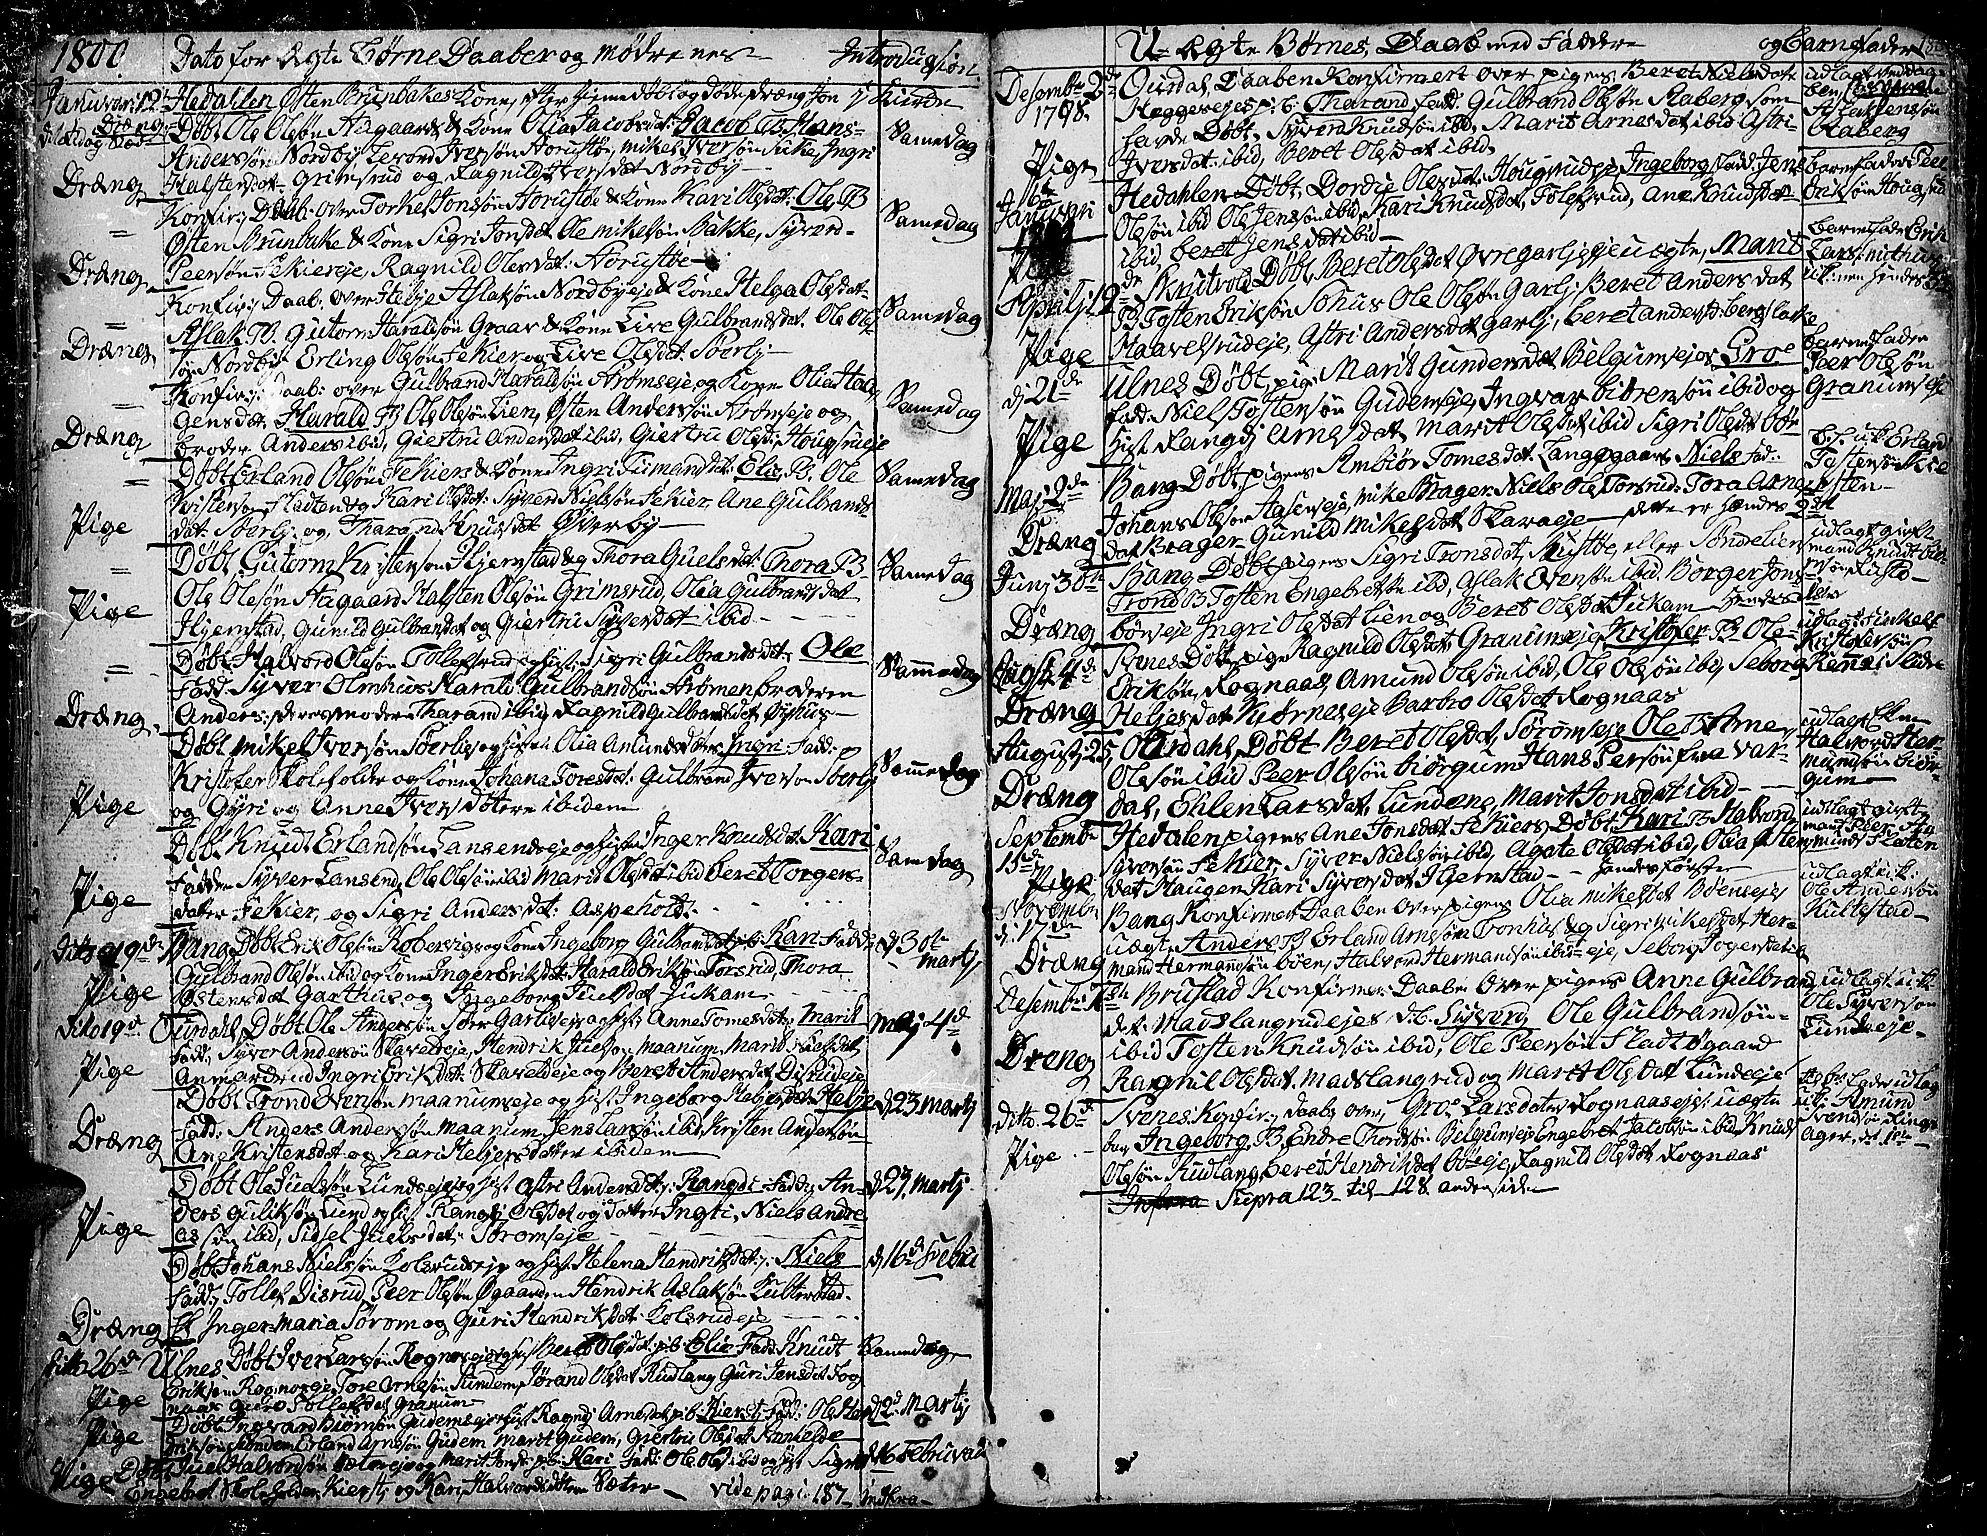 SAH, Aurdal prestekontor, Ministerialbok nr. 6, 1781-1804, s. 186